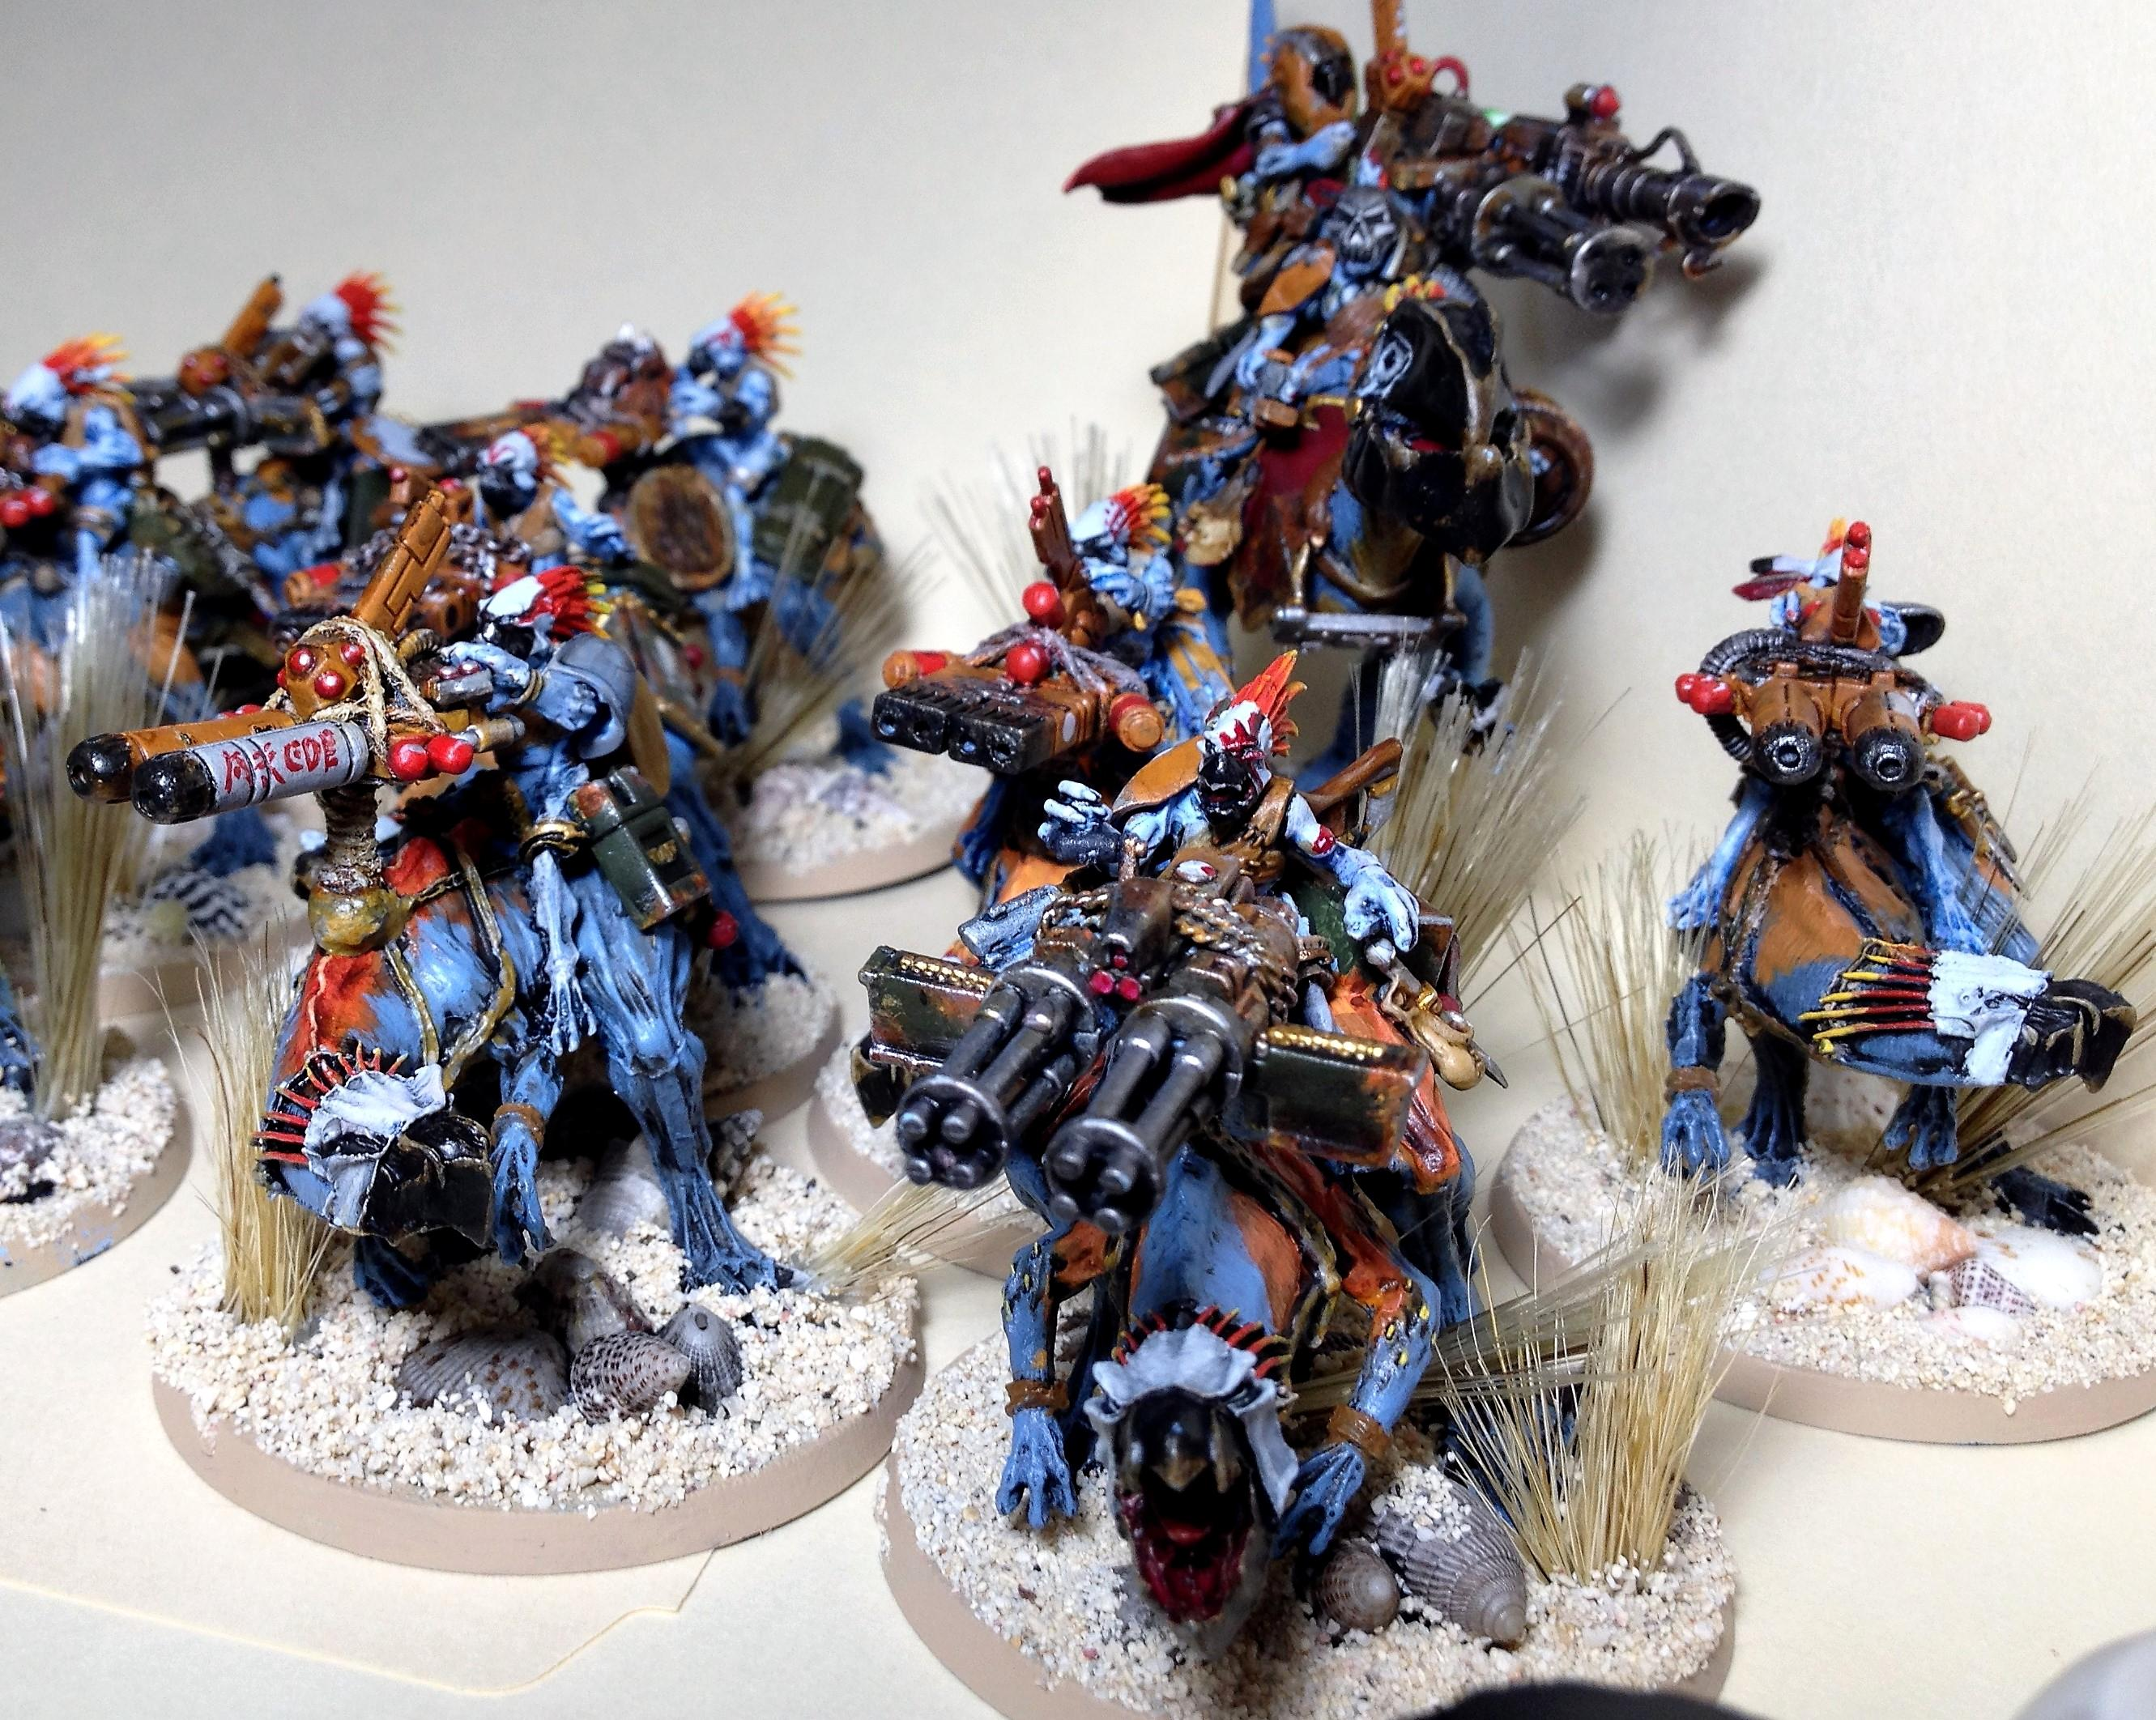 Cavalry, Conversion, Greater Knarloc, Heavy, Knarloc, Kroot, Kroot Hound, Stampede, Weapon